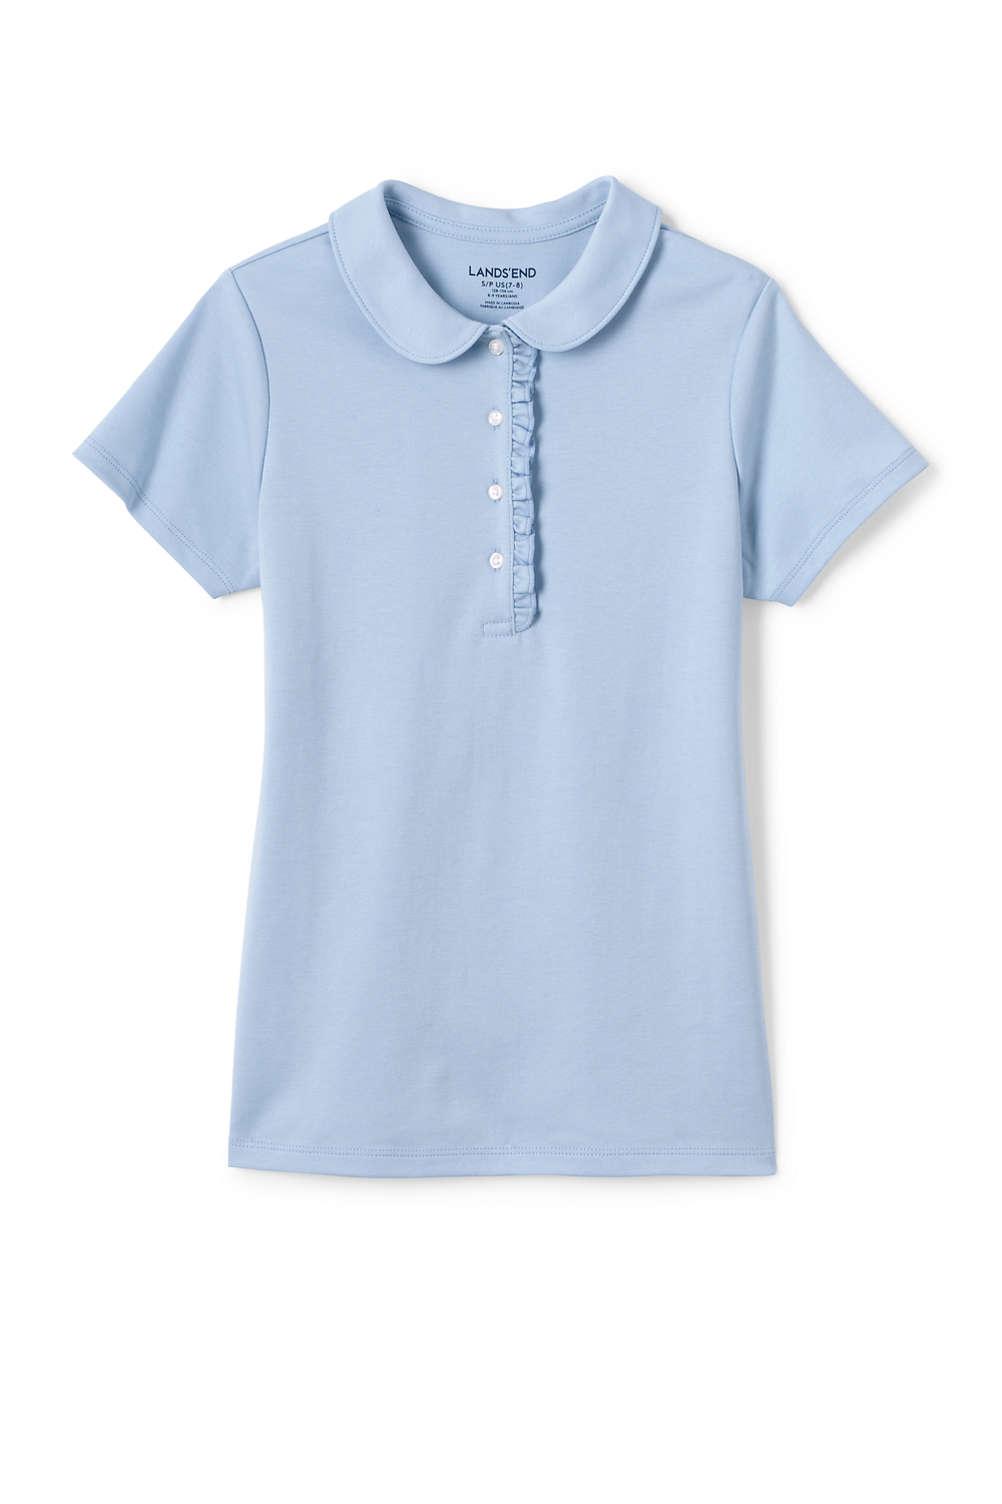 46ca3ef911397 School Uniform Short Sleeve Ruffle Placket Peter Pan Shirt from ...